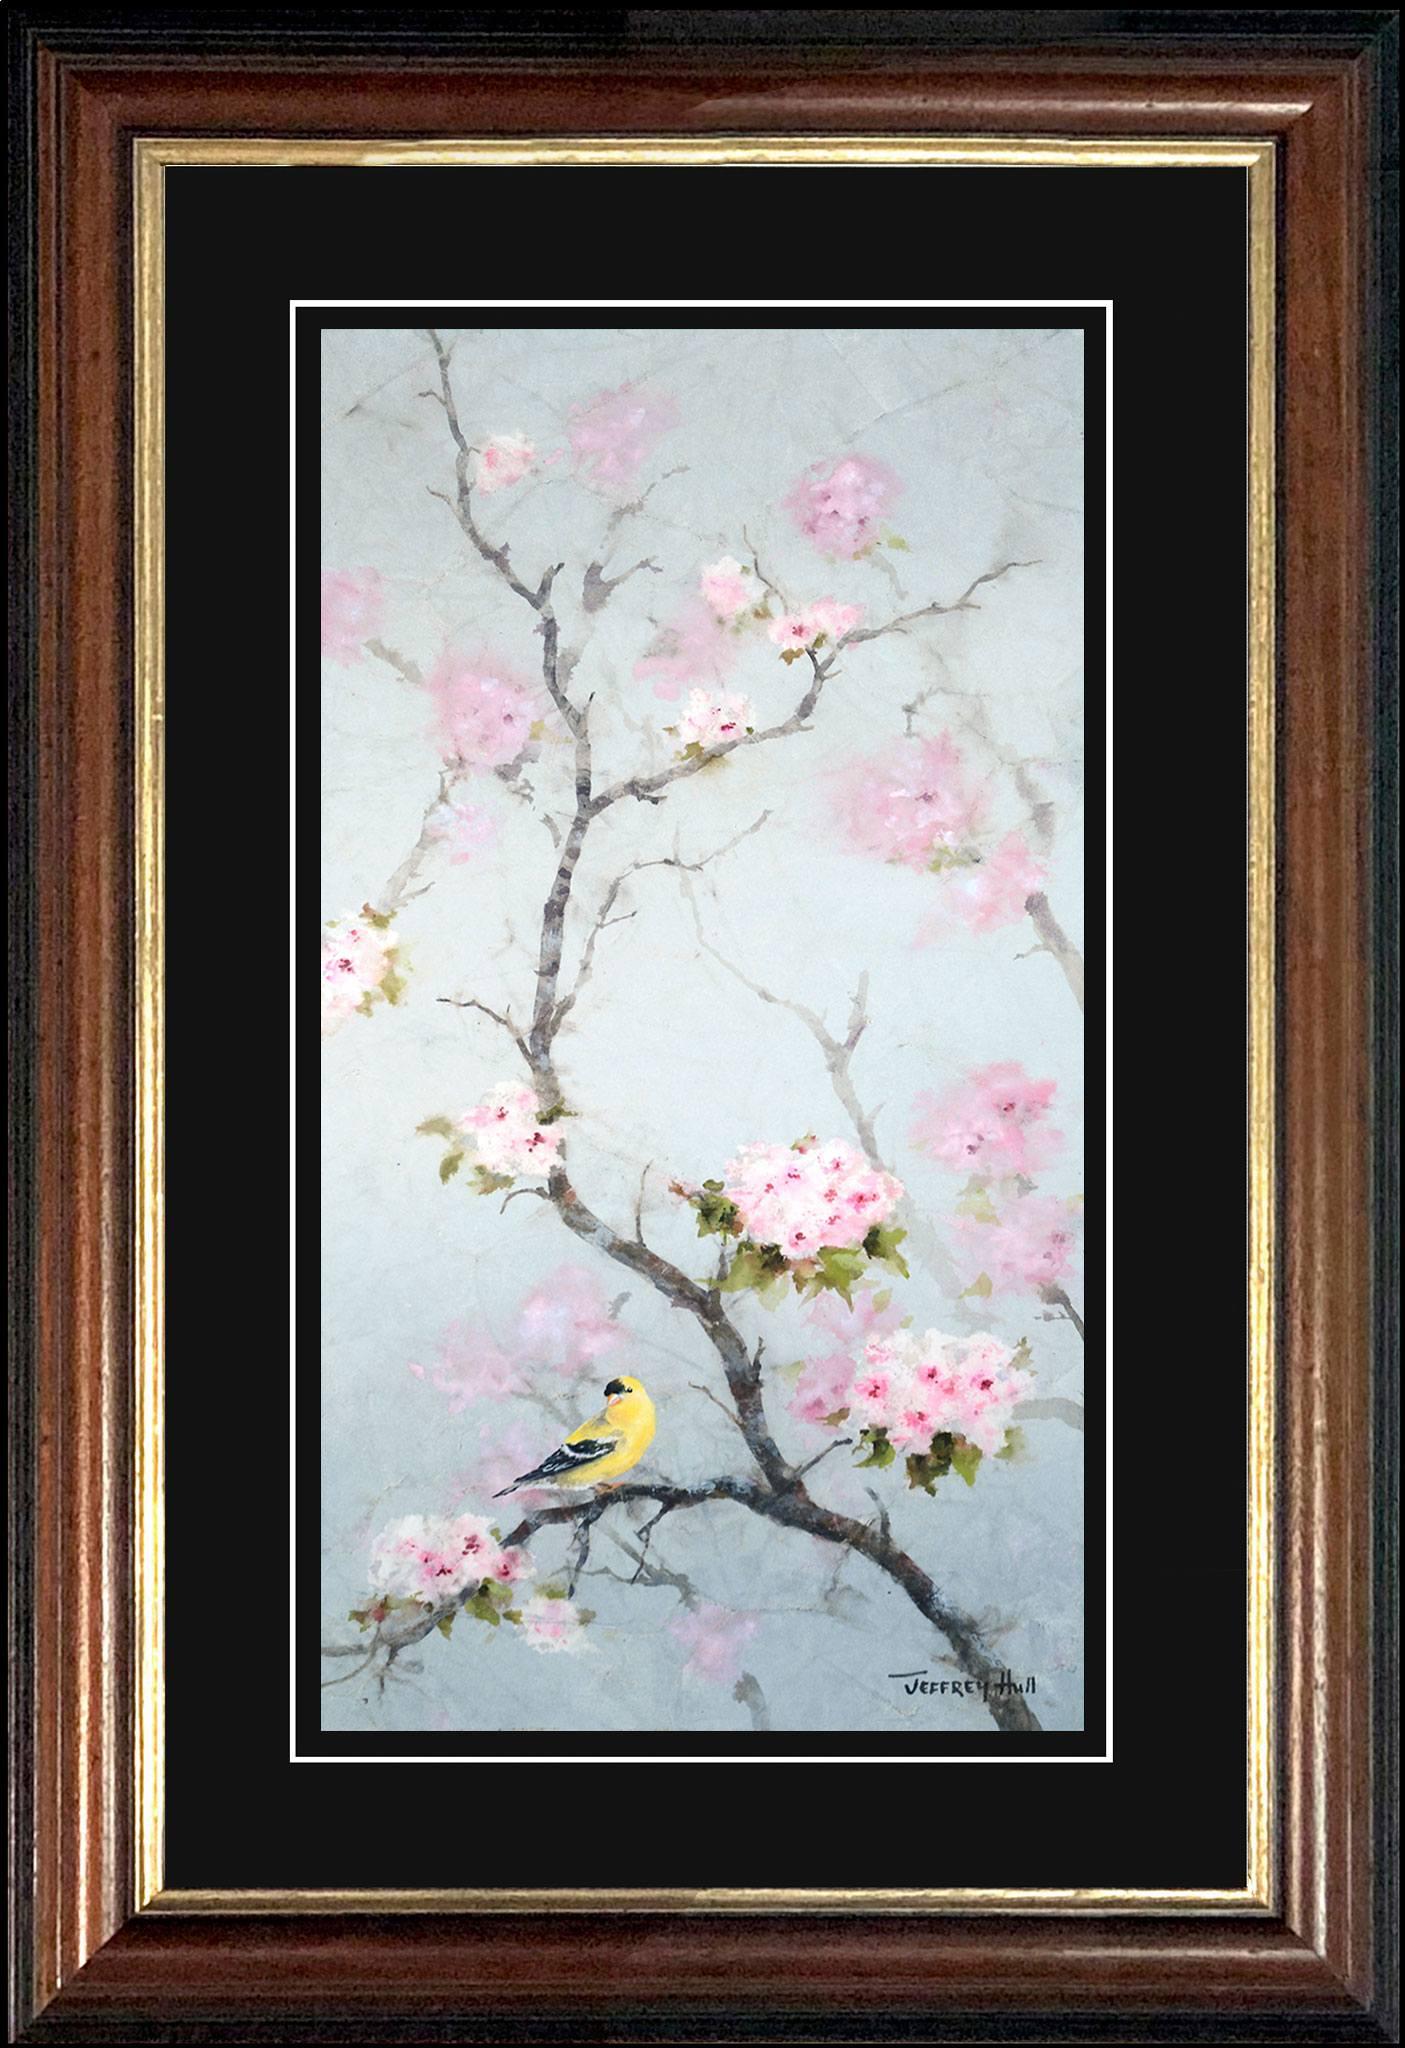 Goldfinch-_-Cherry-Blossoms-OpenEd-Malabar-Jet-Black-4-Website-2021